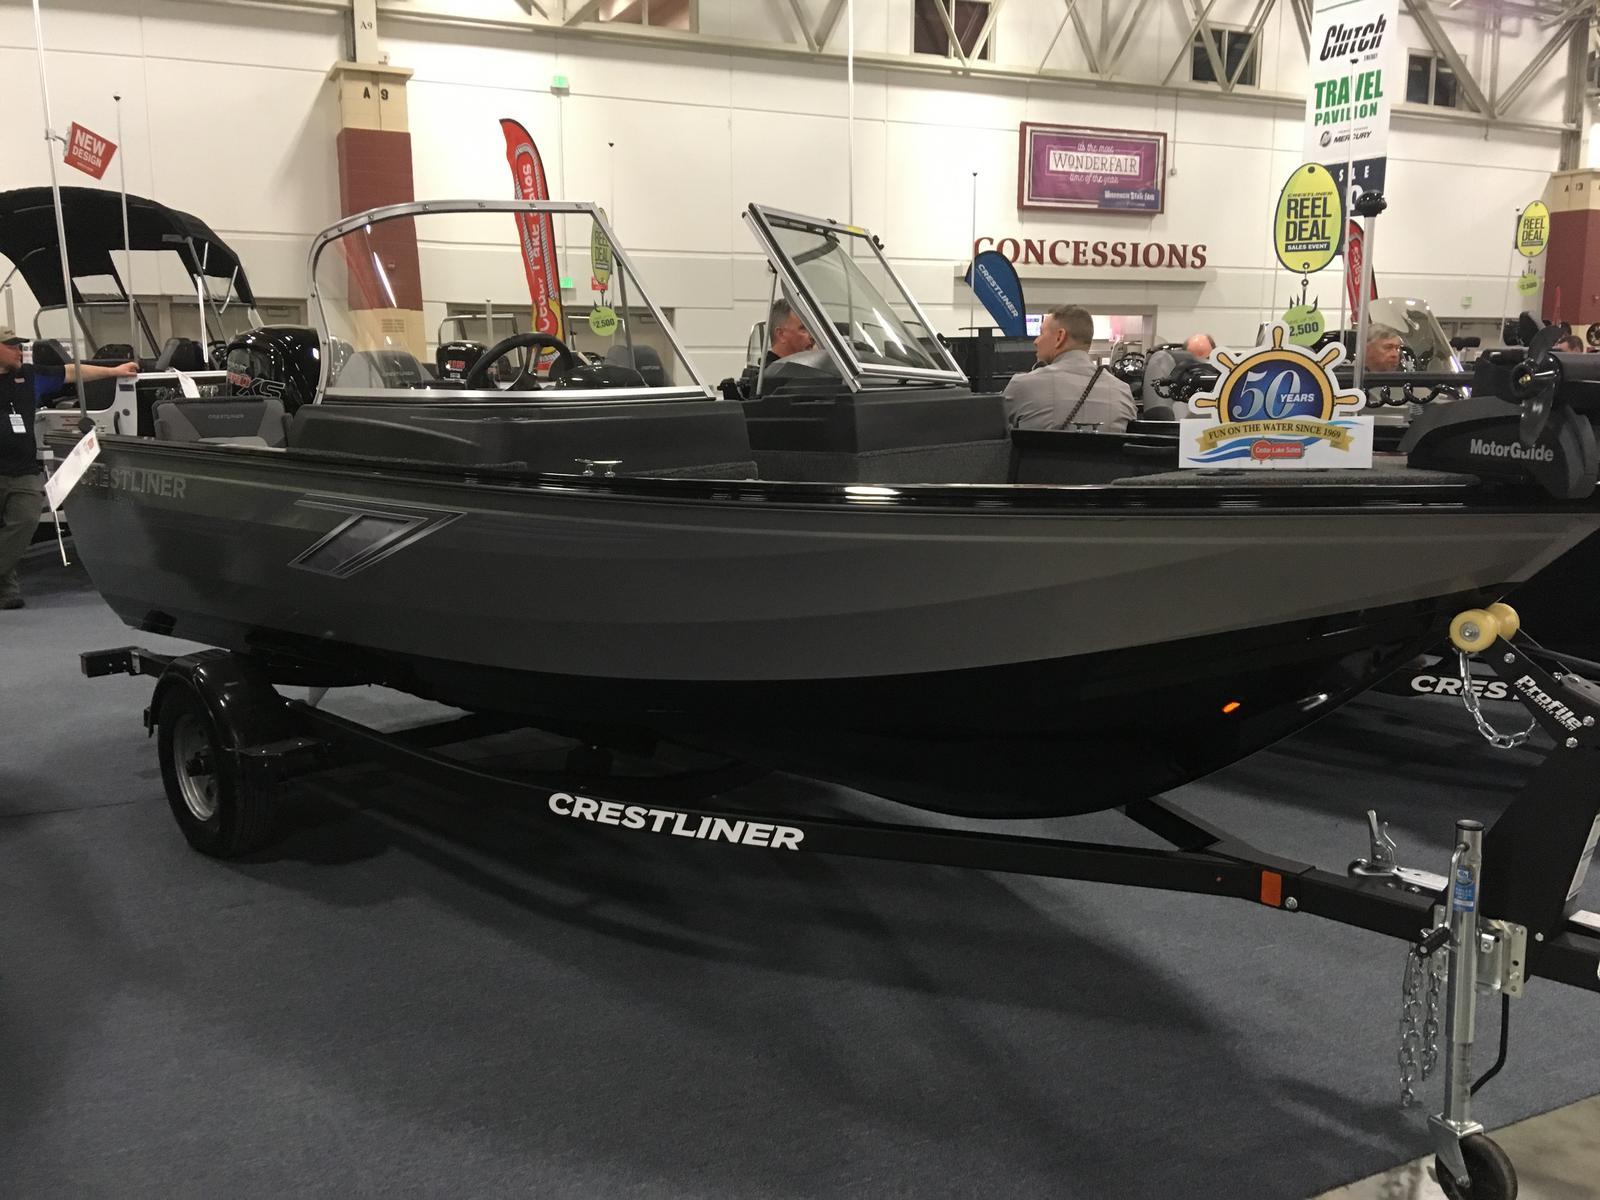 Crestliner 1650 FISH HAWK WT JUMPSEAT